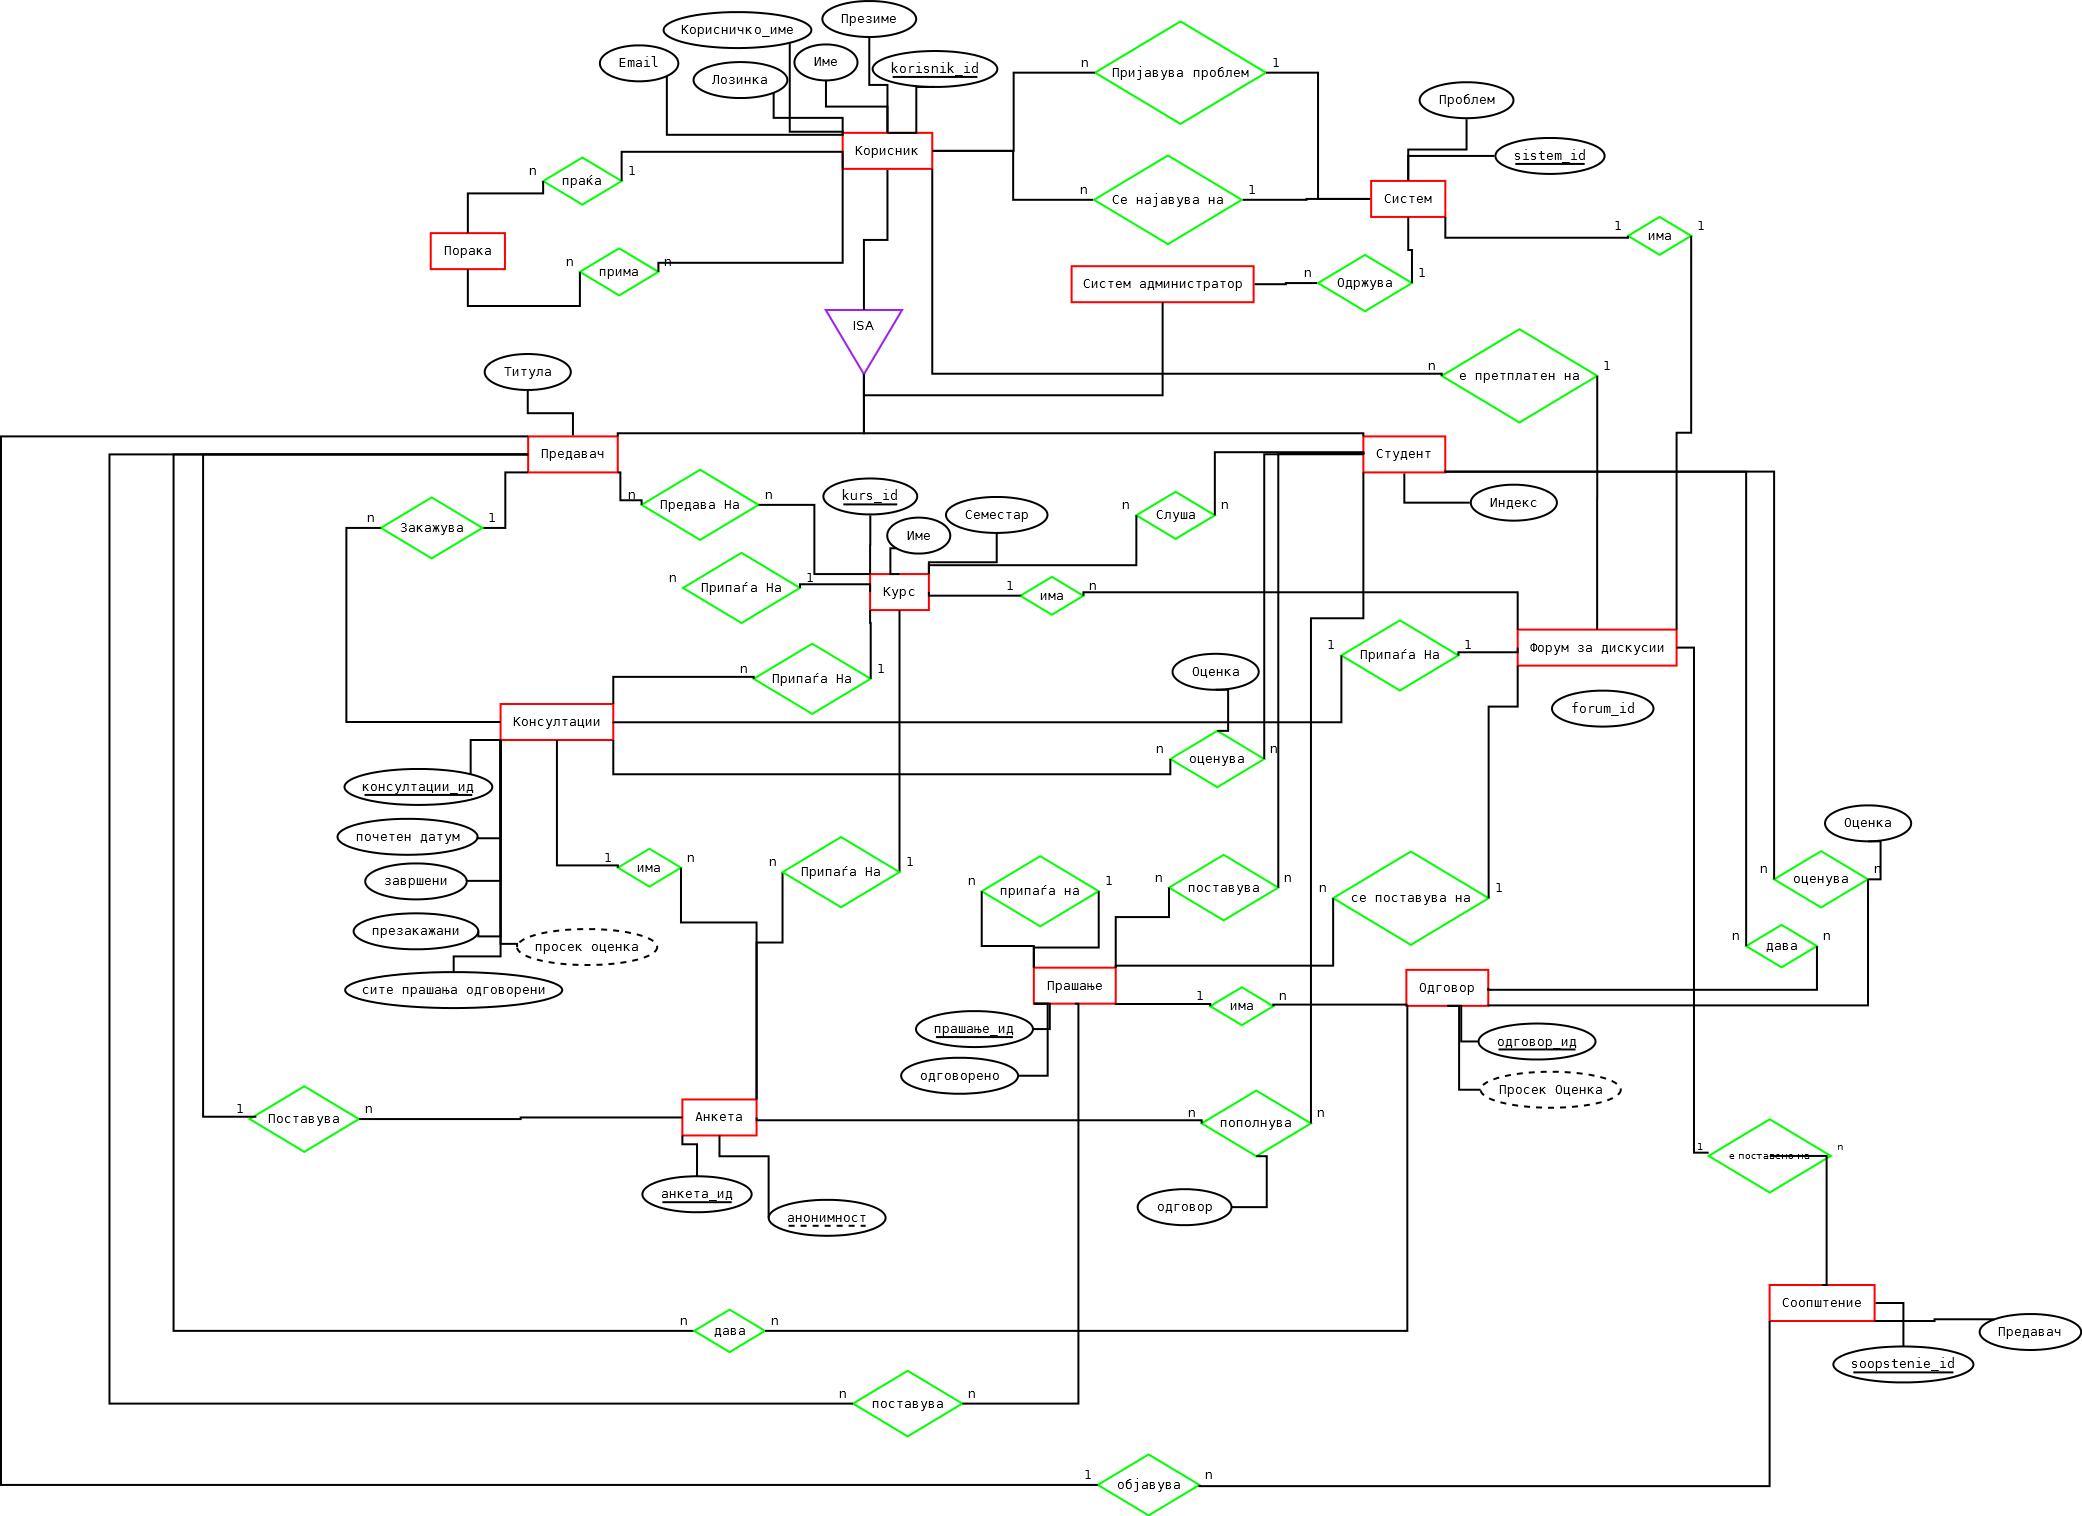 Vision1arhitekturaerdijagram student information systems of er diagram online consultation 25112013 erdiagramcons2g 1972 pooptronica